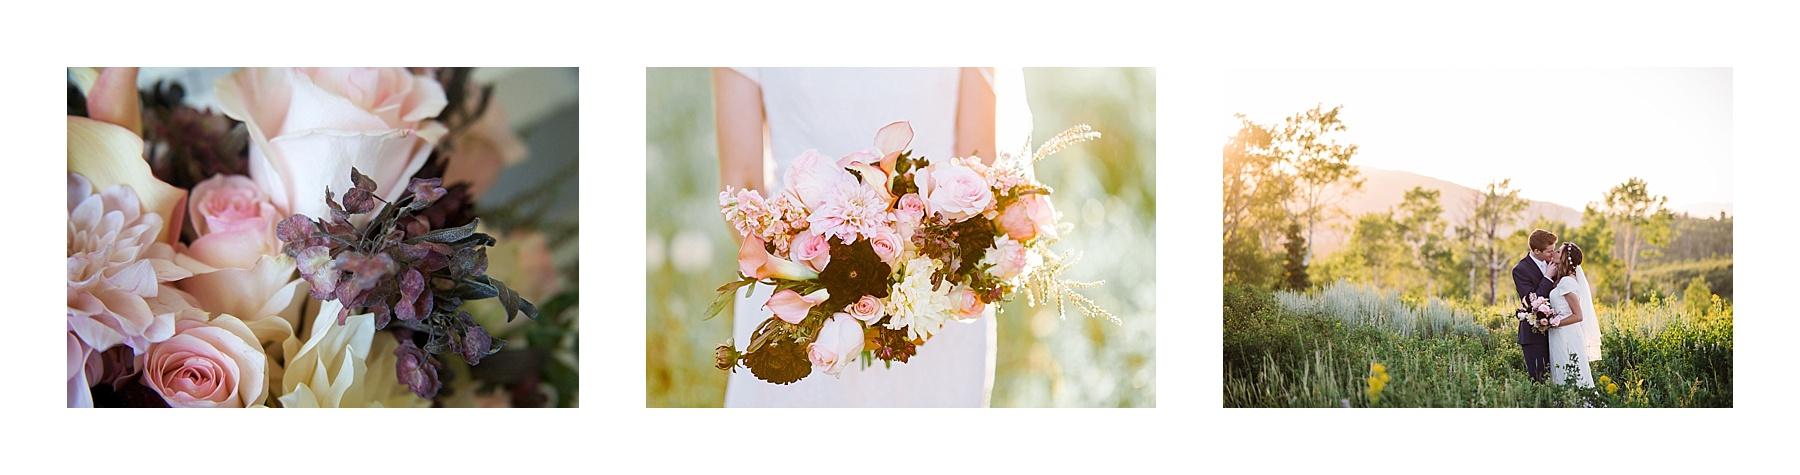 blush-burgandy-bouquet_0640.jpg